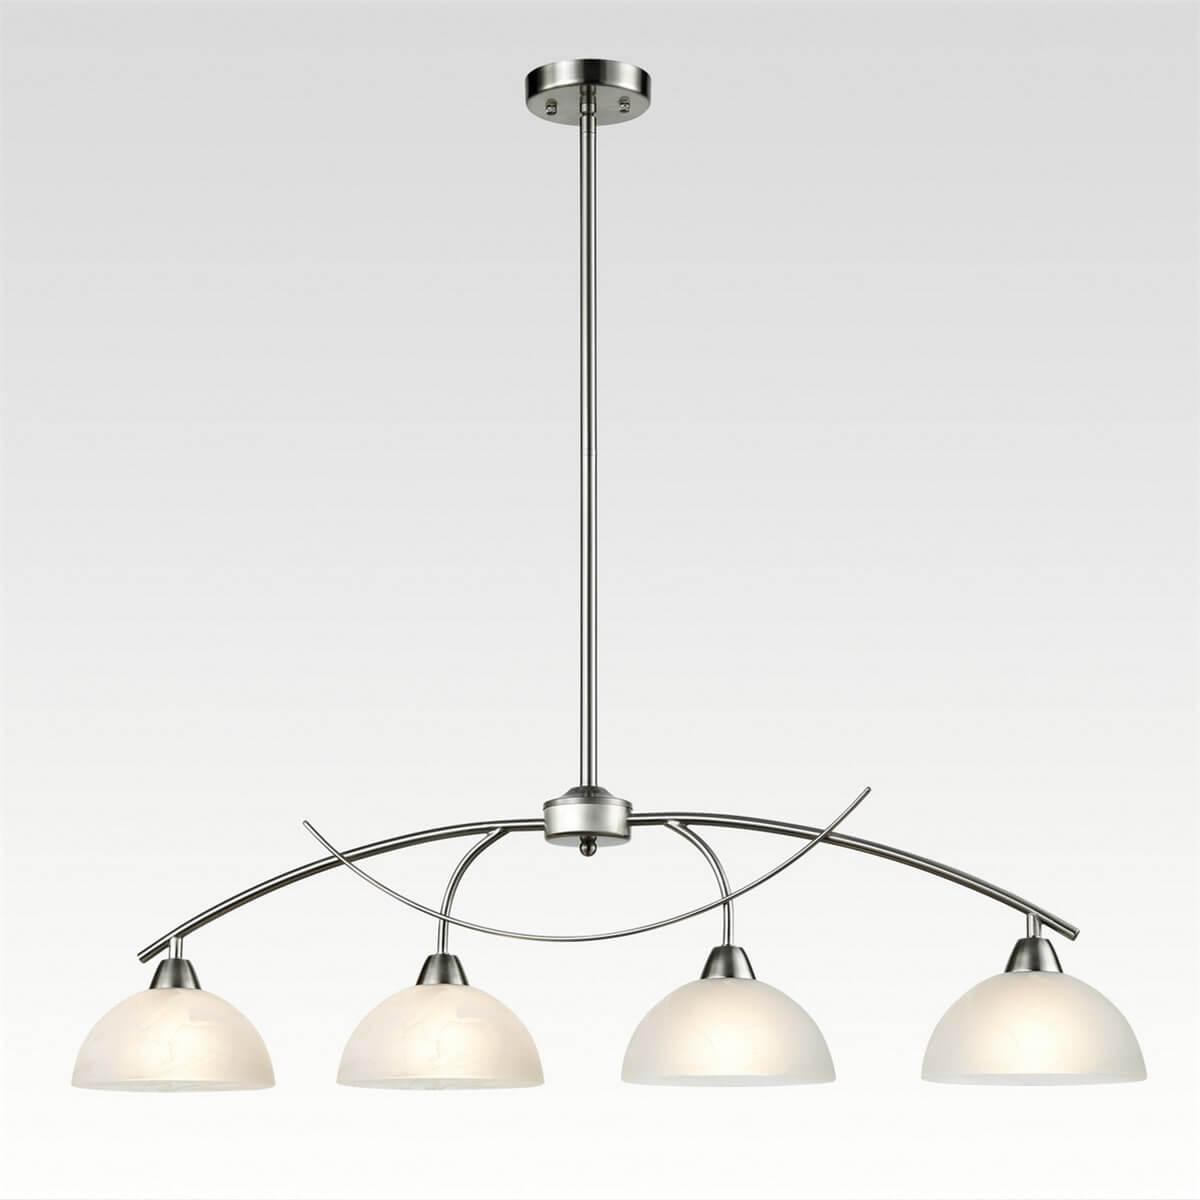 Modern 4-Light Kitchen Pendant Lighting, Brushed Nickel